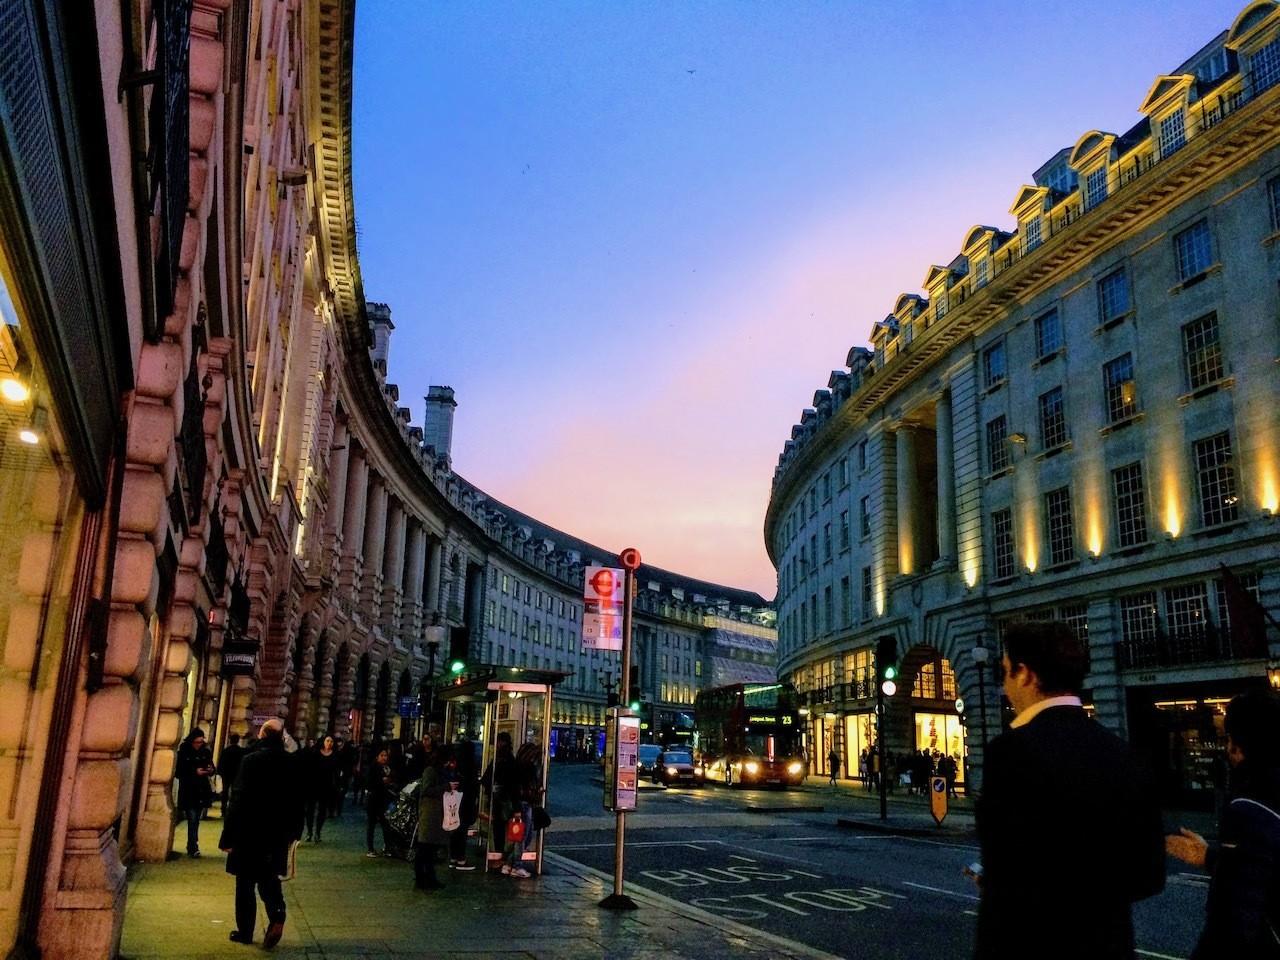 Regents Street at dusk London